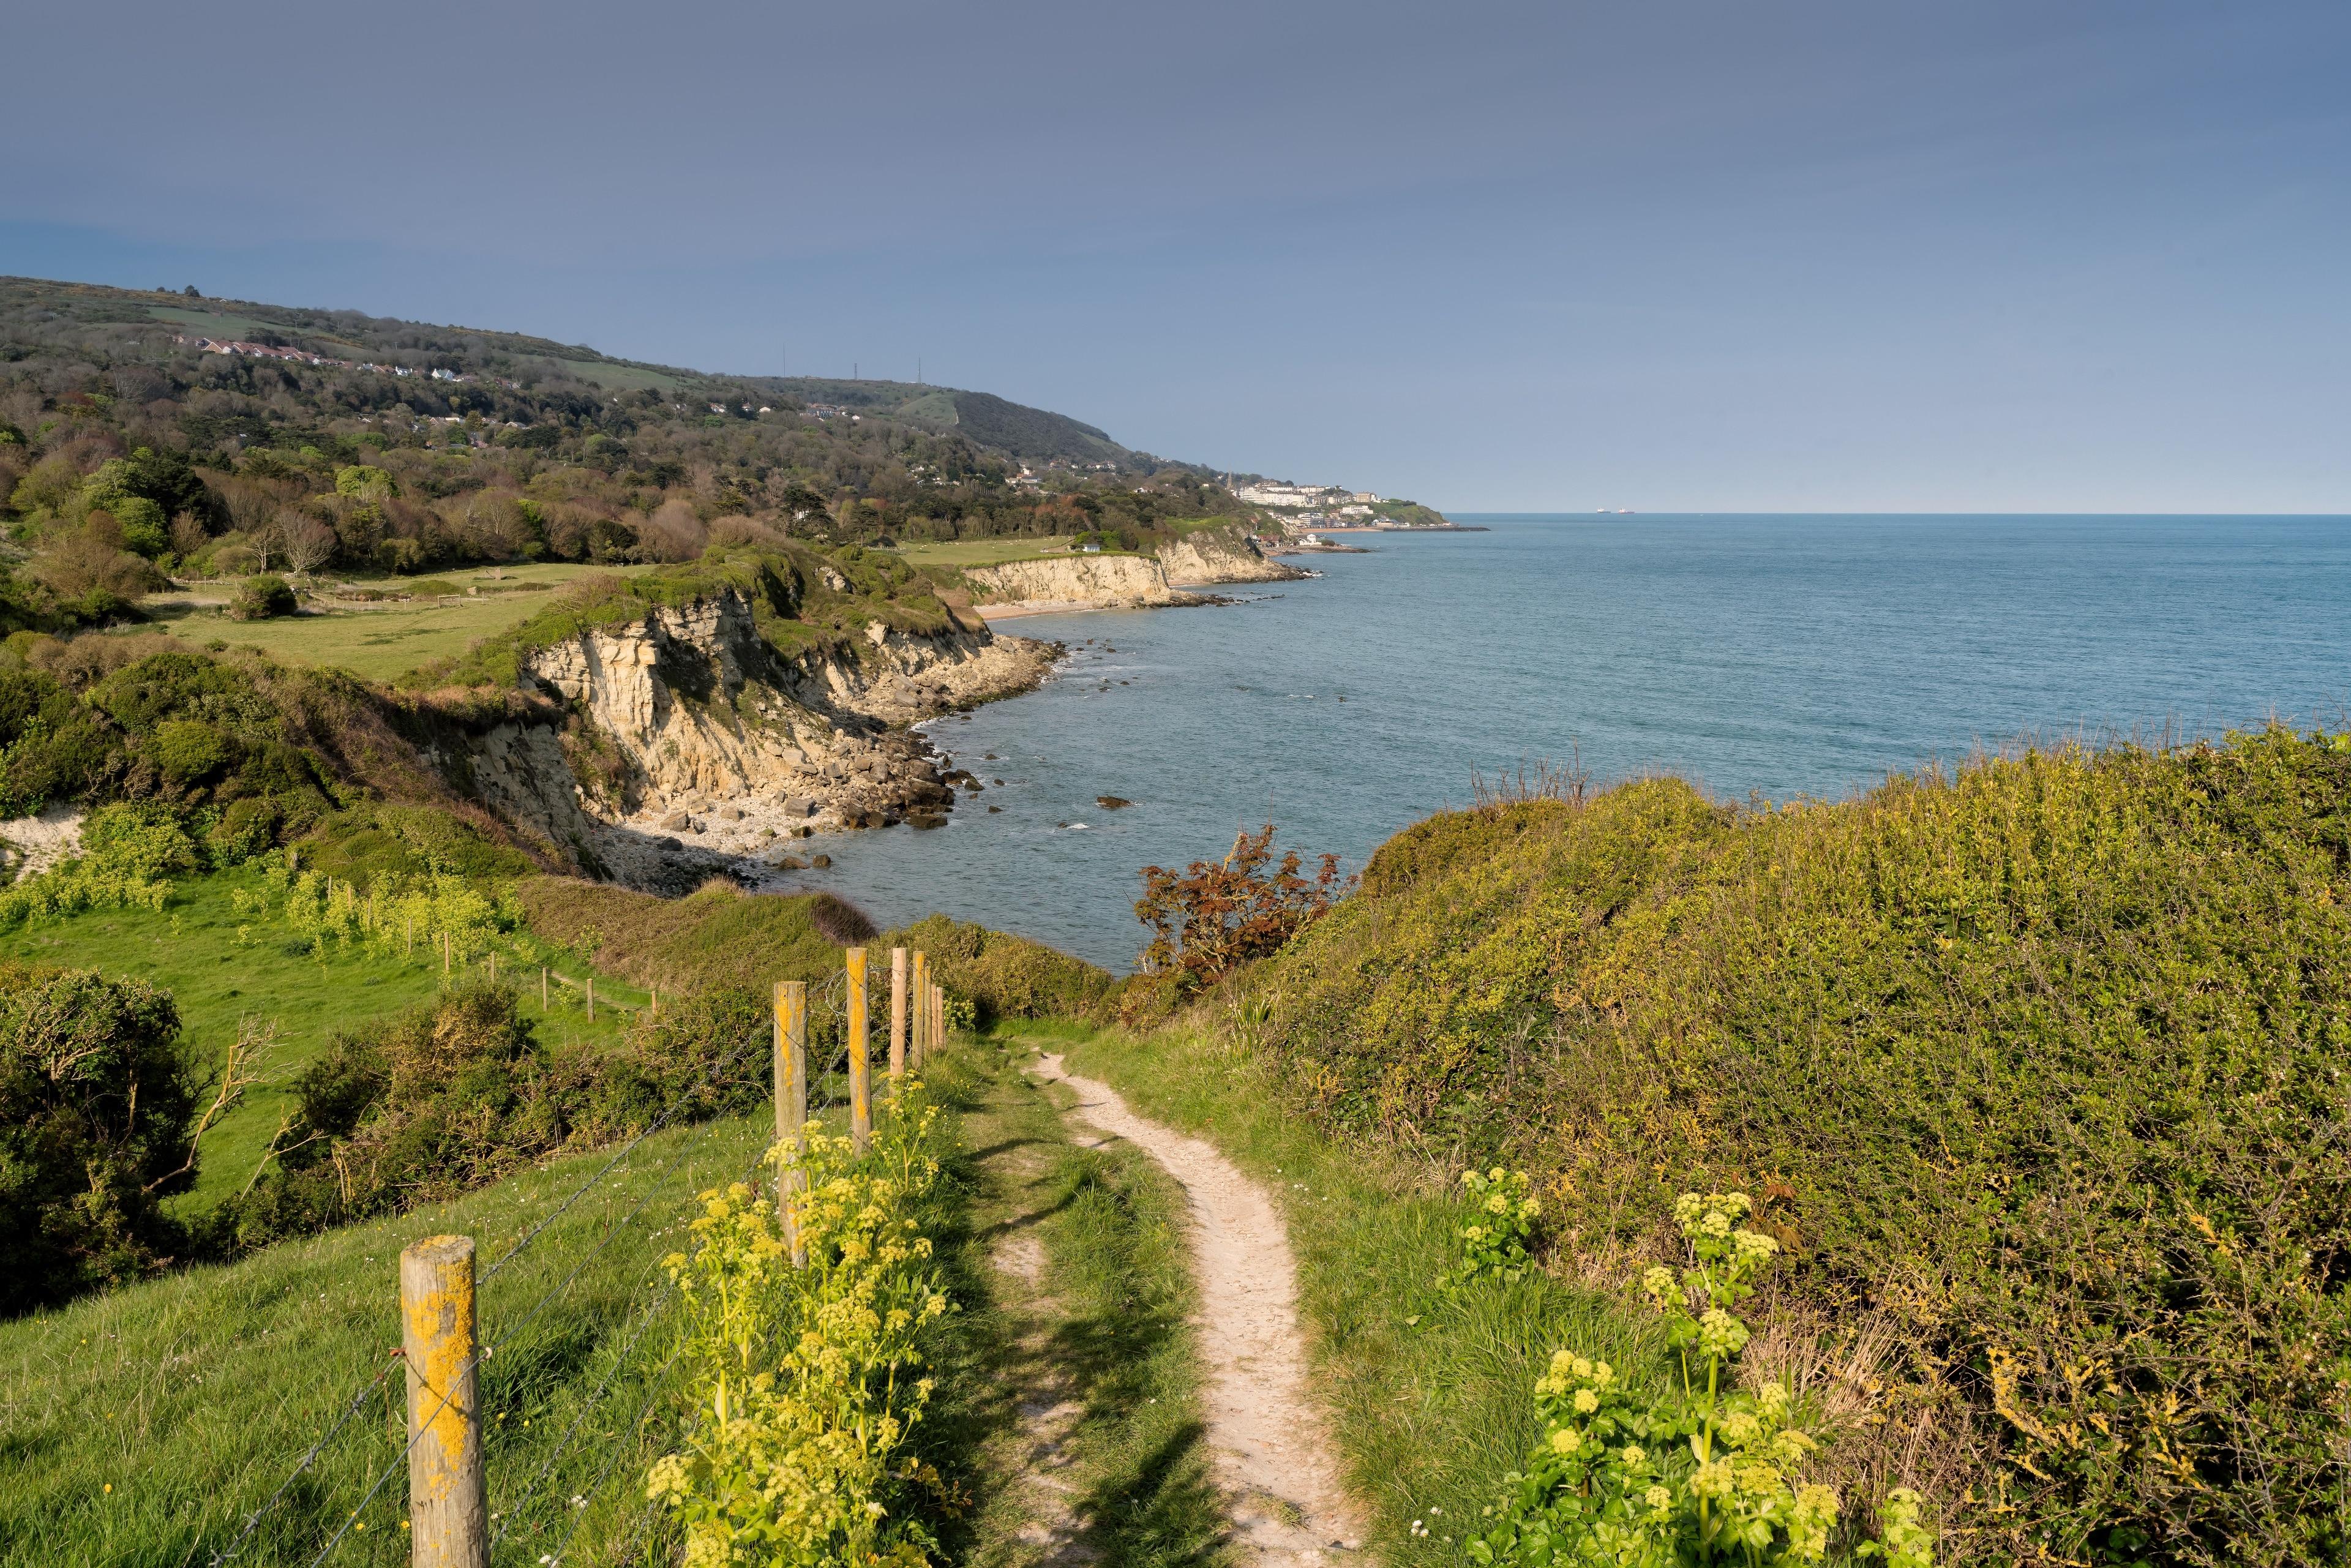 Isle of Wight, England, United Kingdom